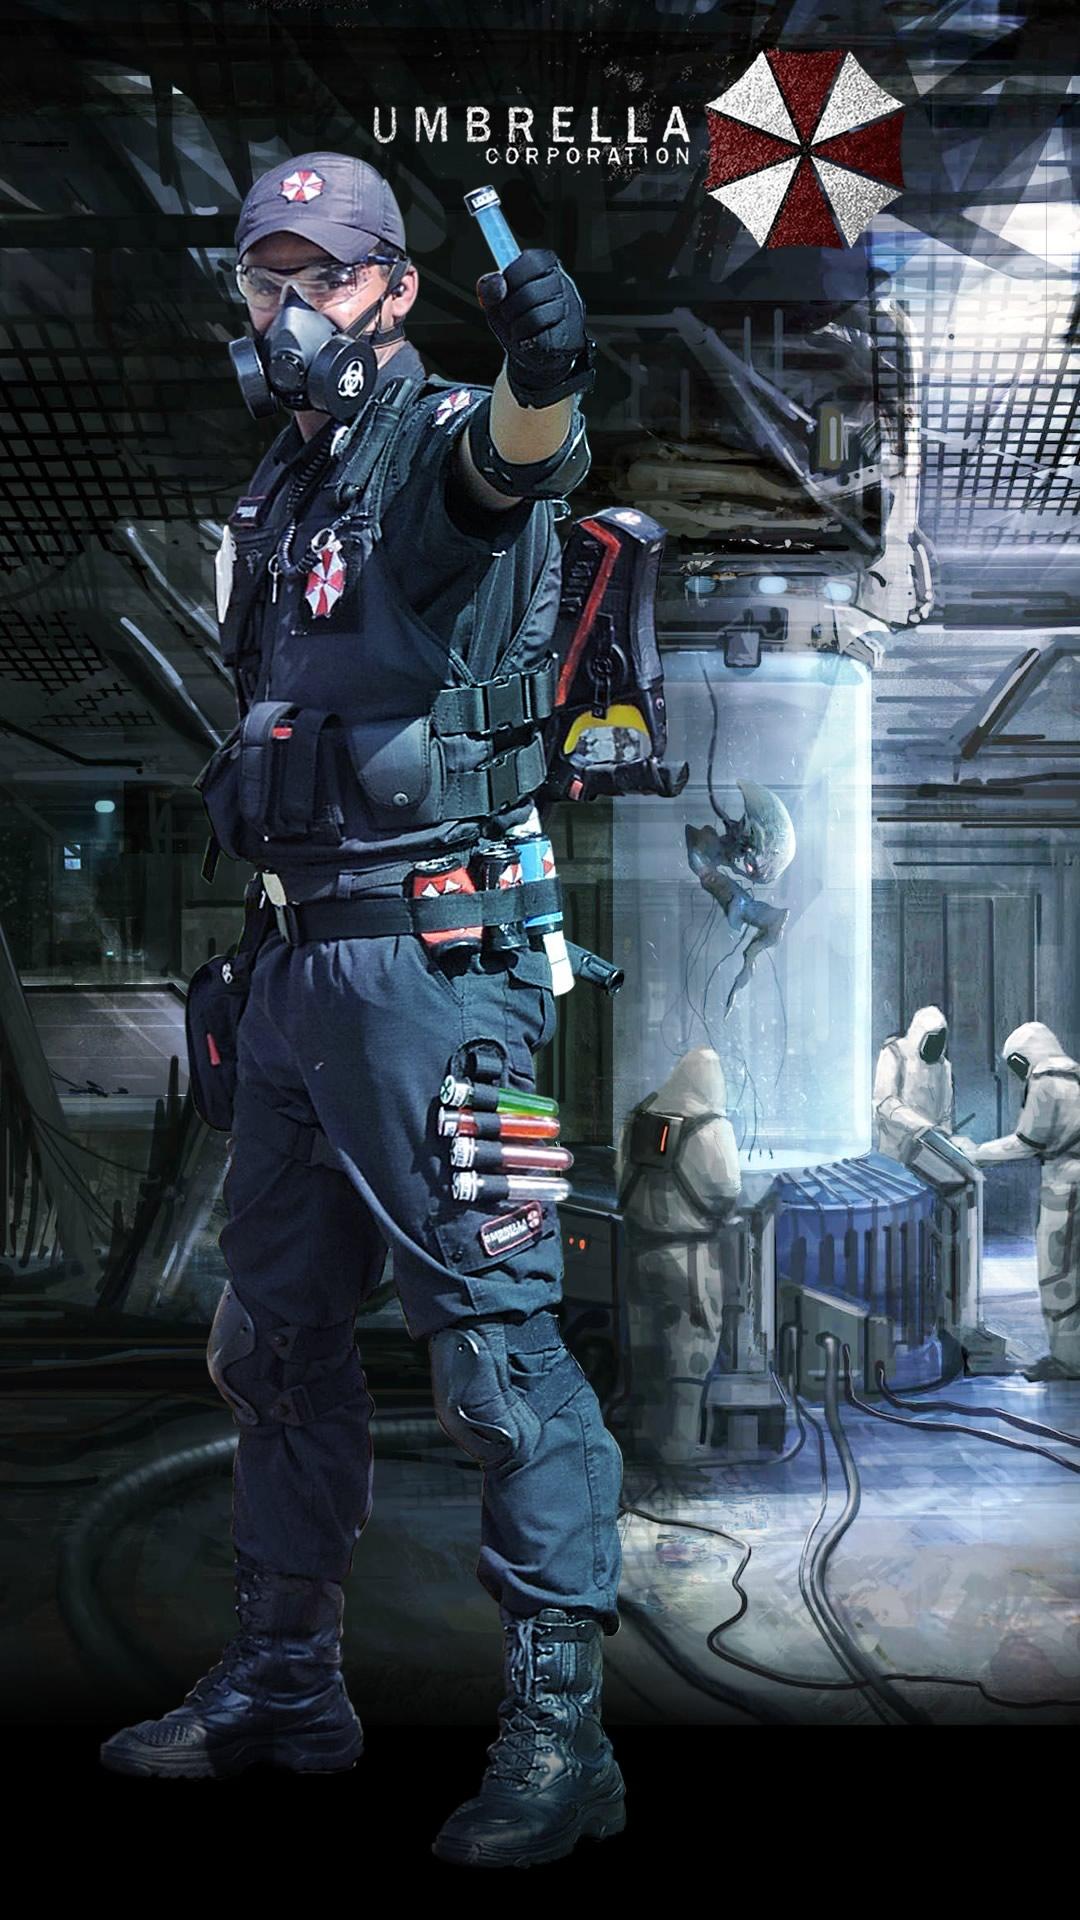 thunder cosplay resident evil umbrella corporation - THUNDER | Cosplayer Resident Evil